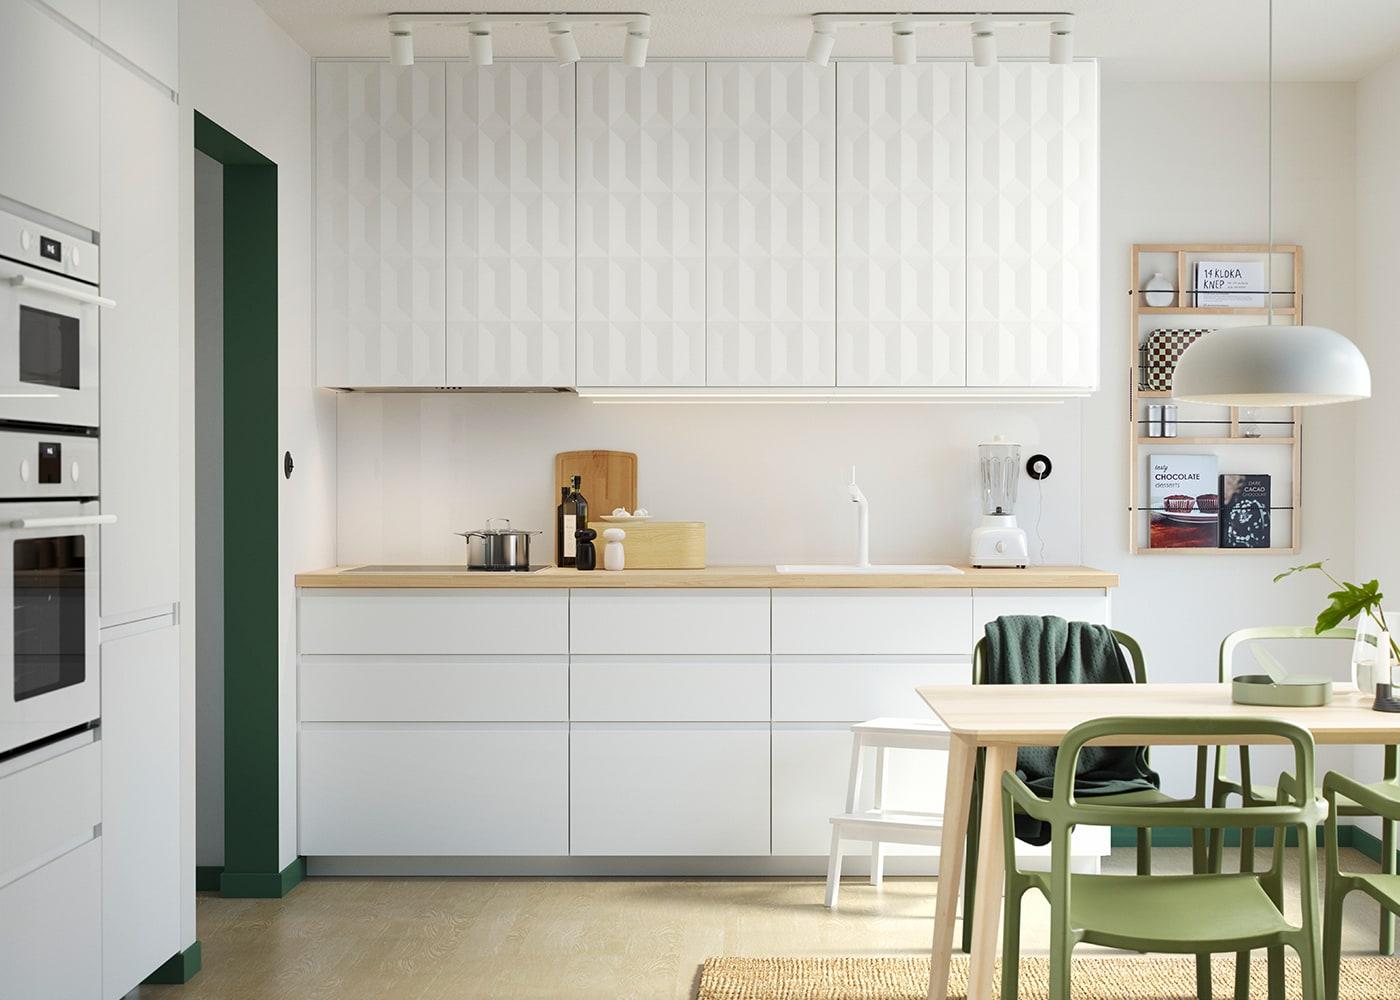 sch n schlicht hell einfach skandinavisch ikea ikea. Black Bedroom Furniture Sets. Home Design Ideas